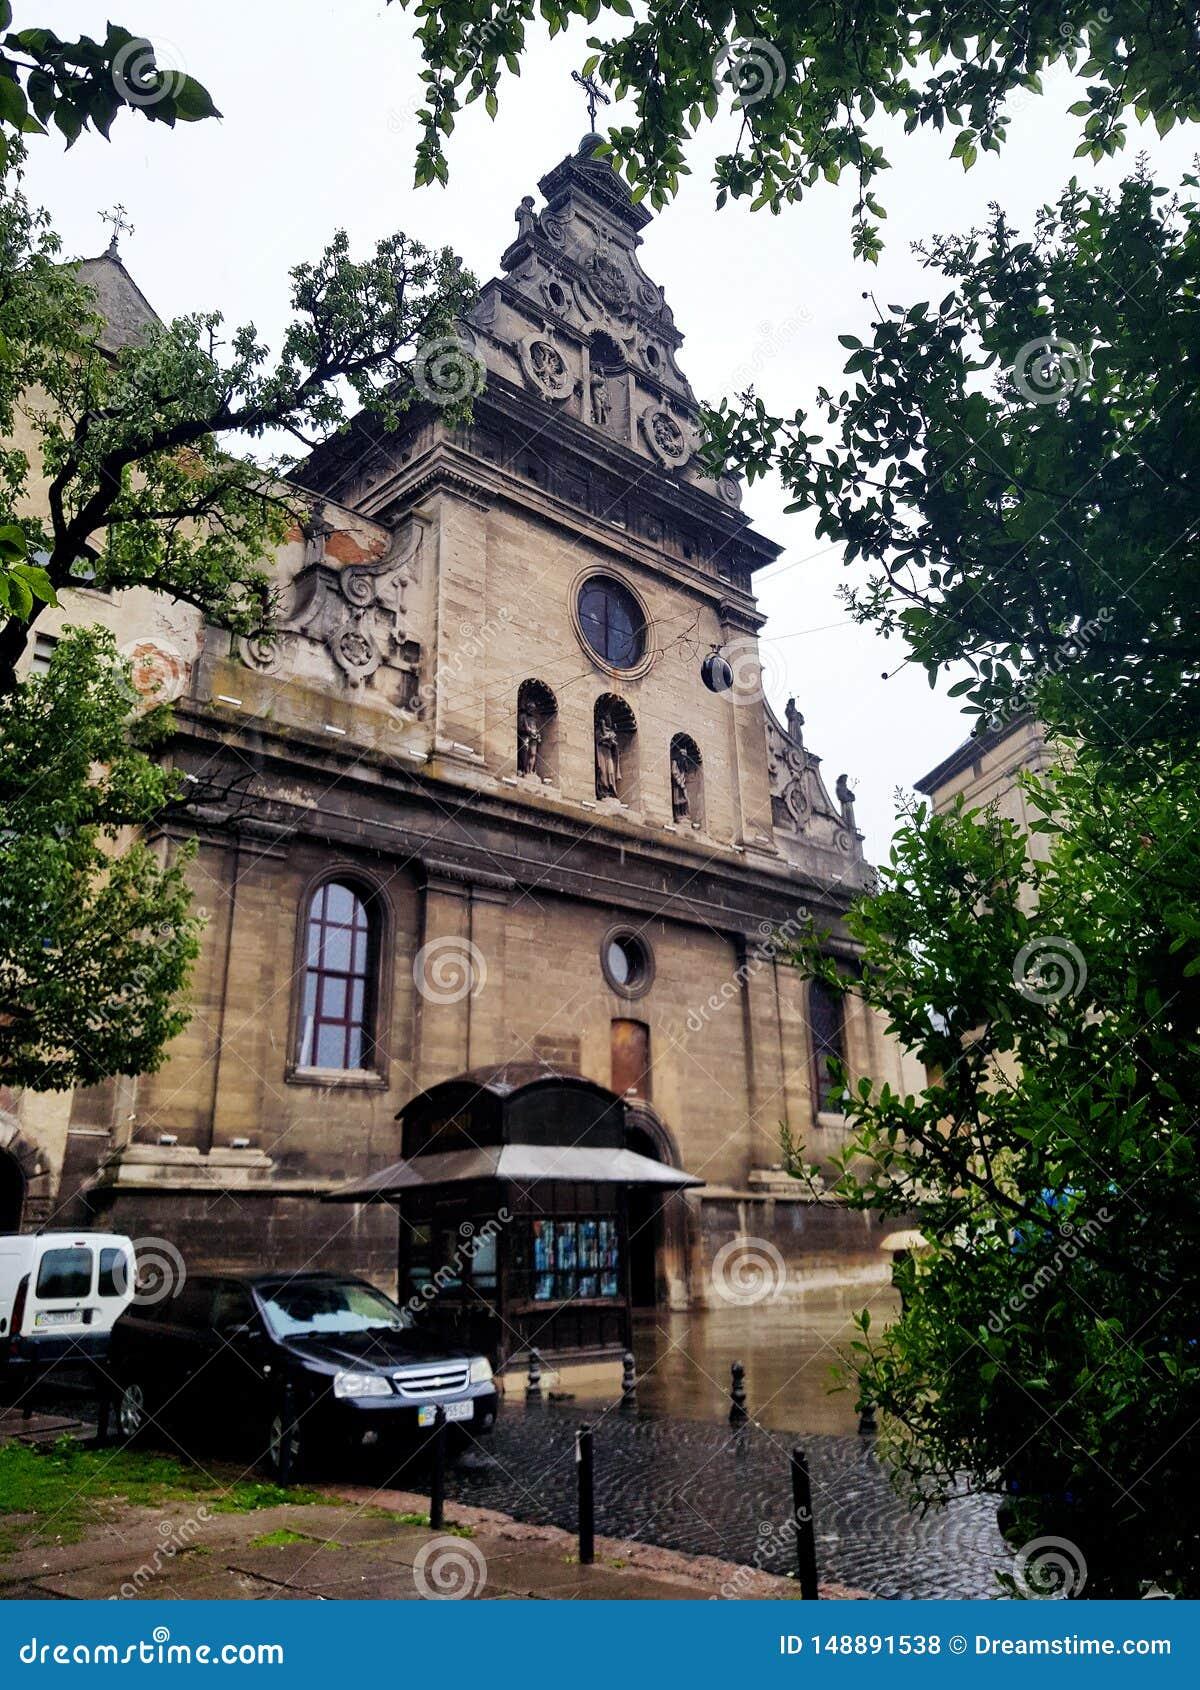 Beautiful old Architecture of the European city Lviv, Ukraine.